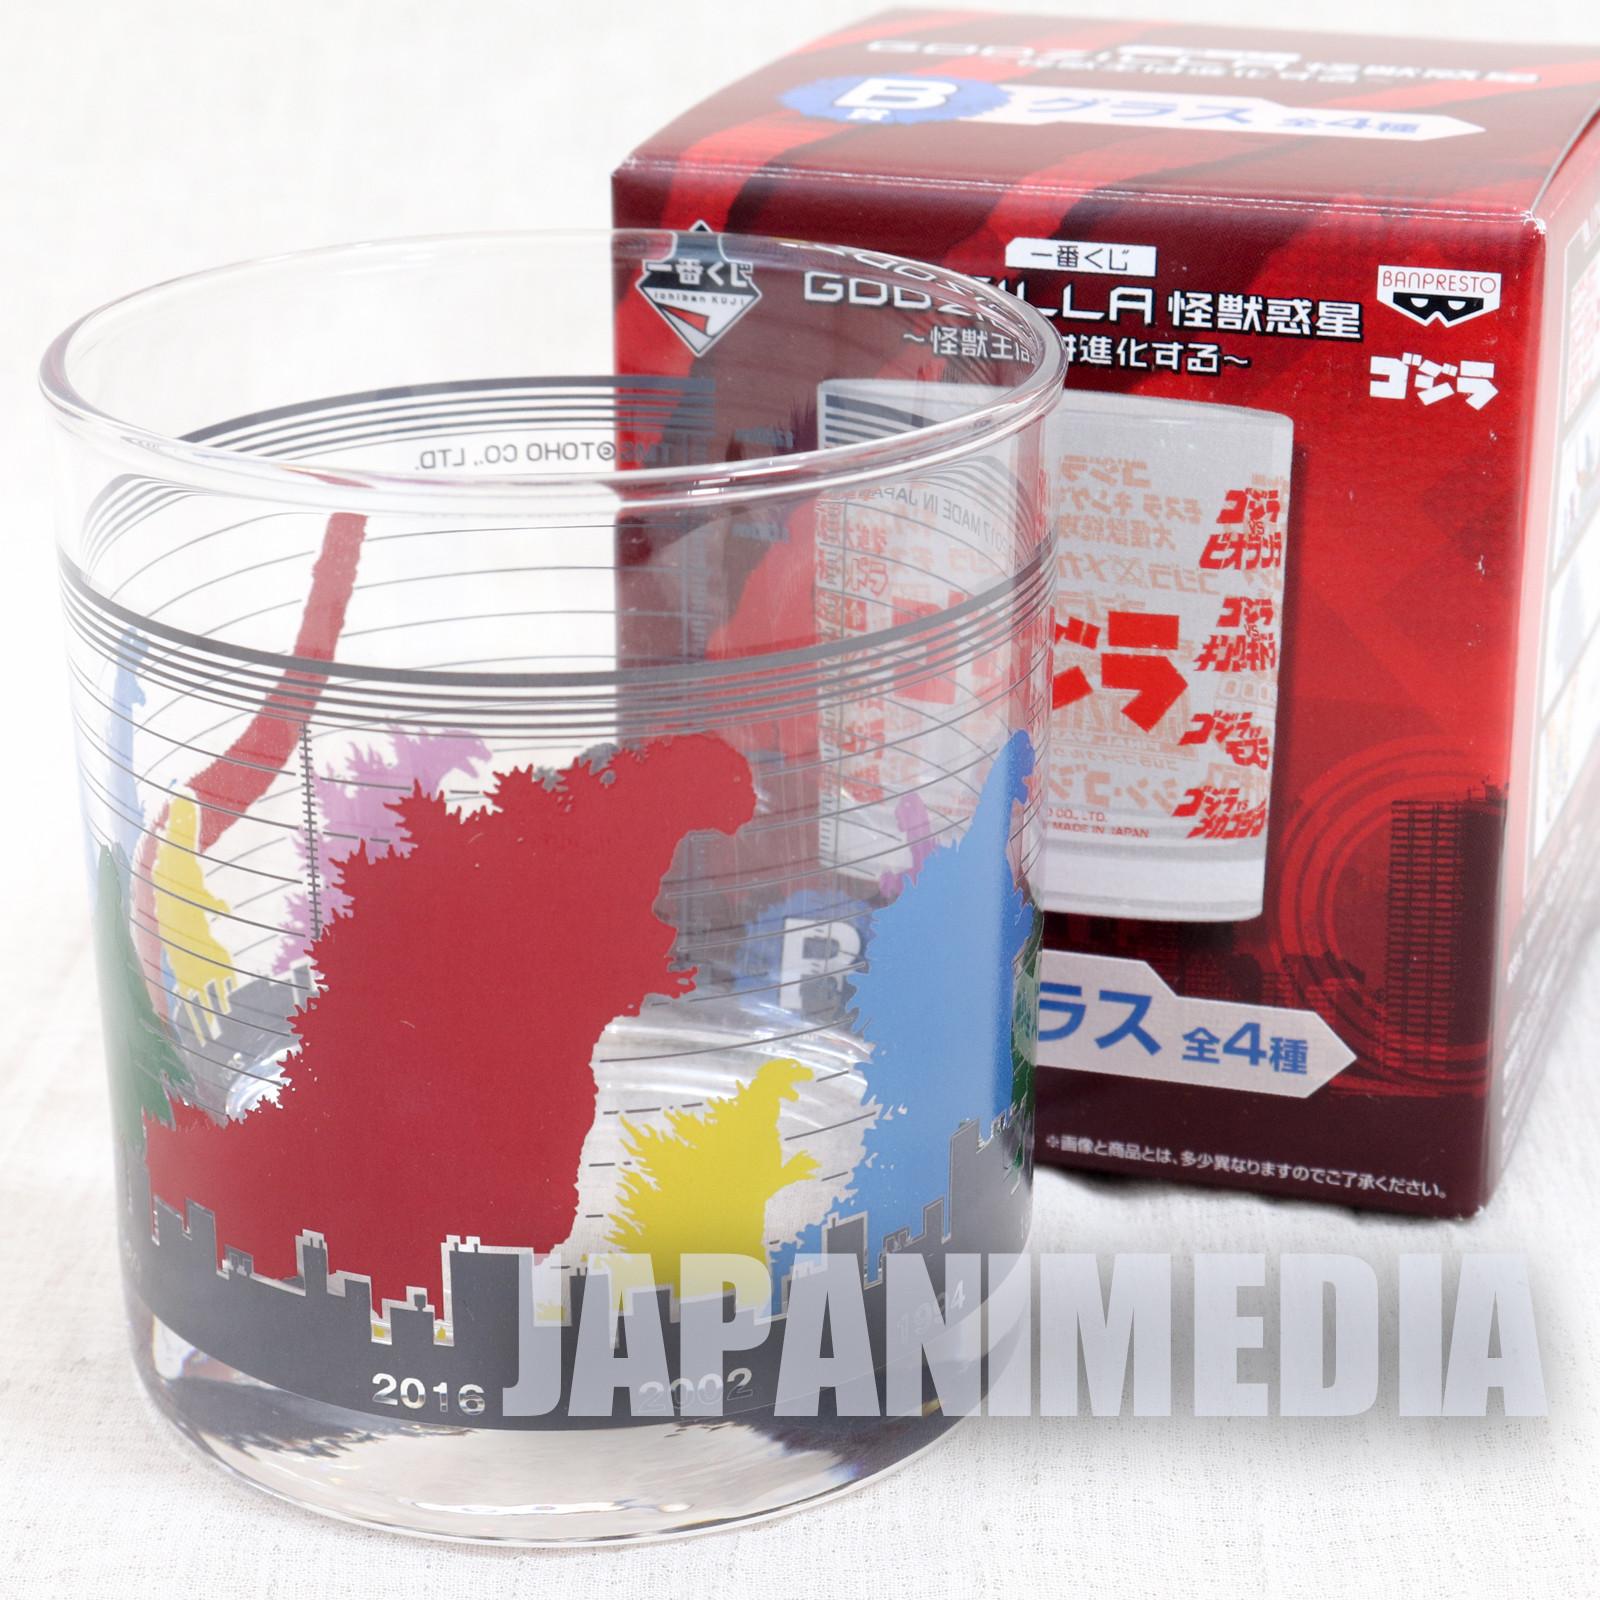 Godzilla Rock Glass #2 Height comparison ver. Banpresto JAPAN TOKUSATSU